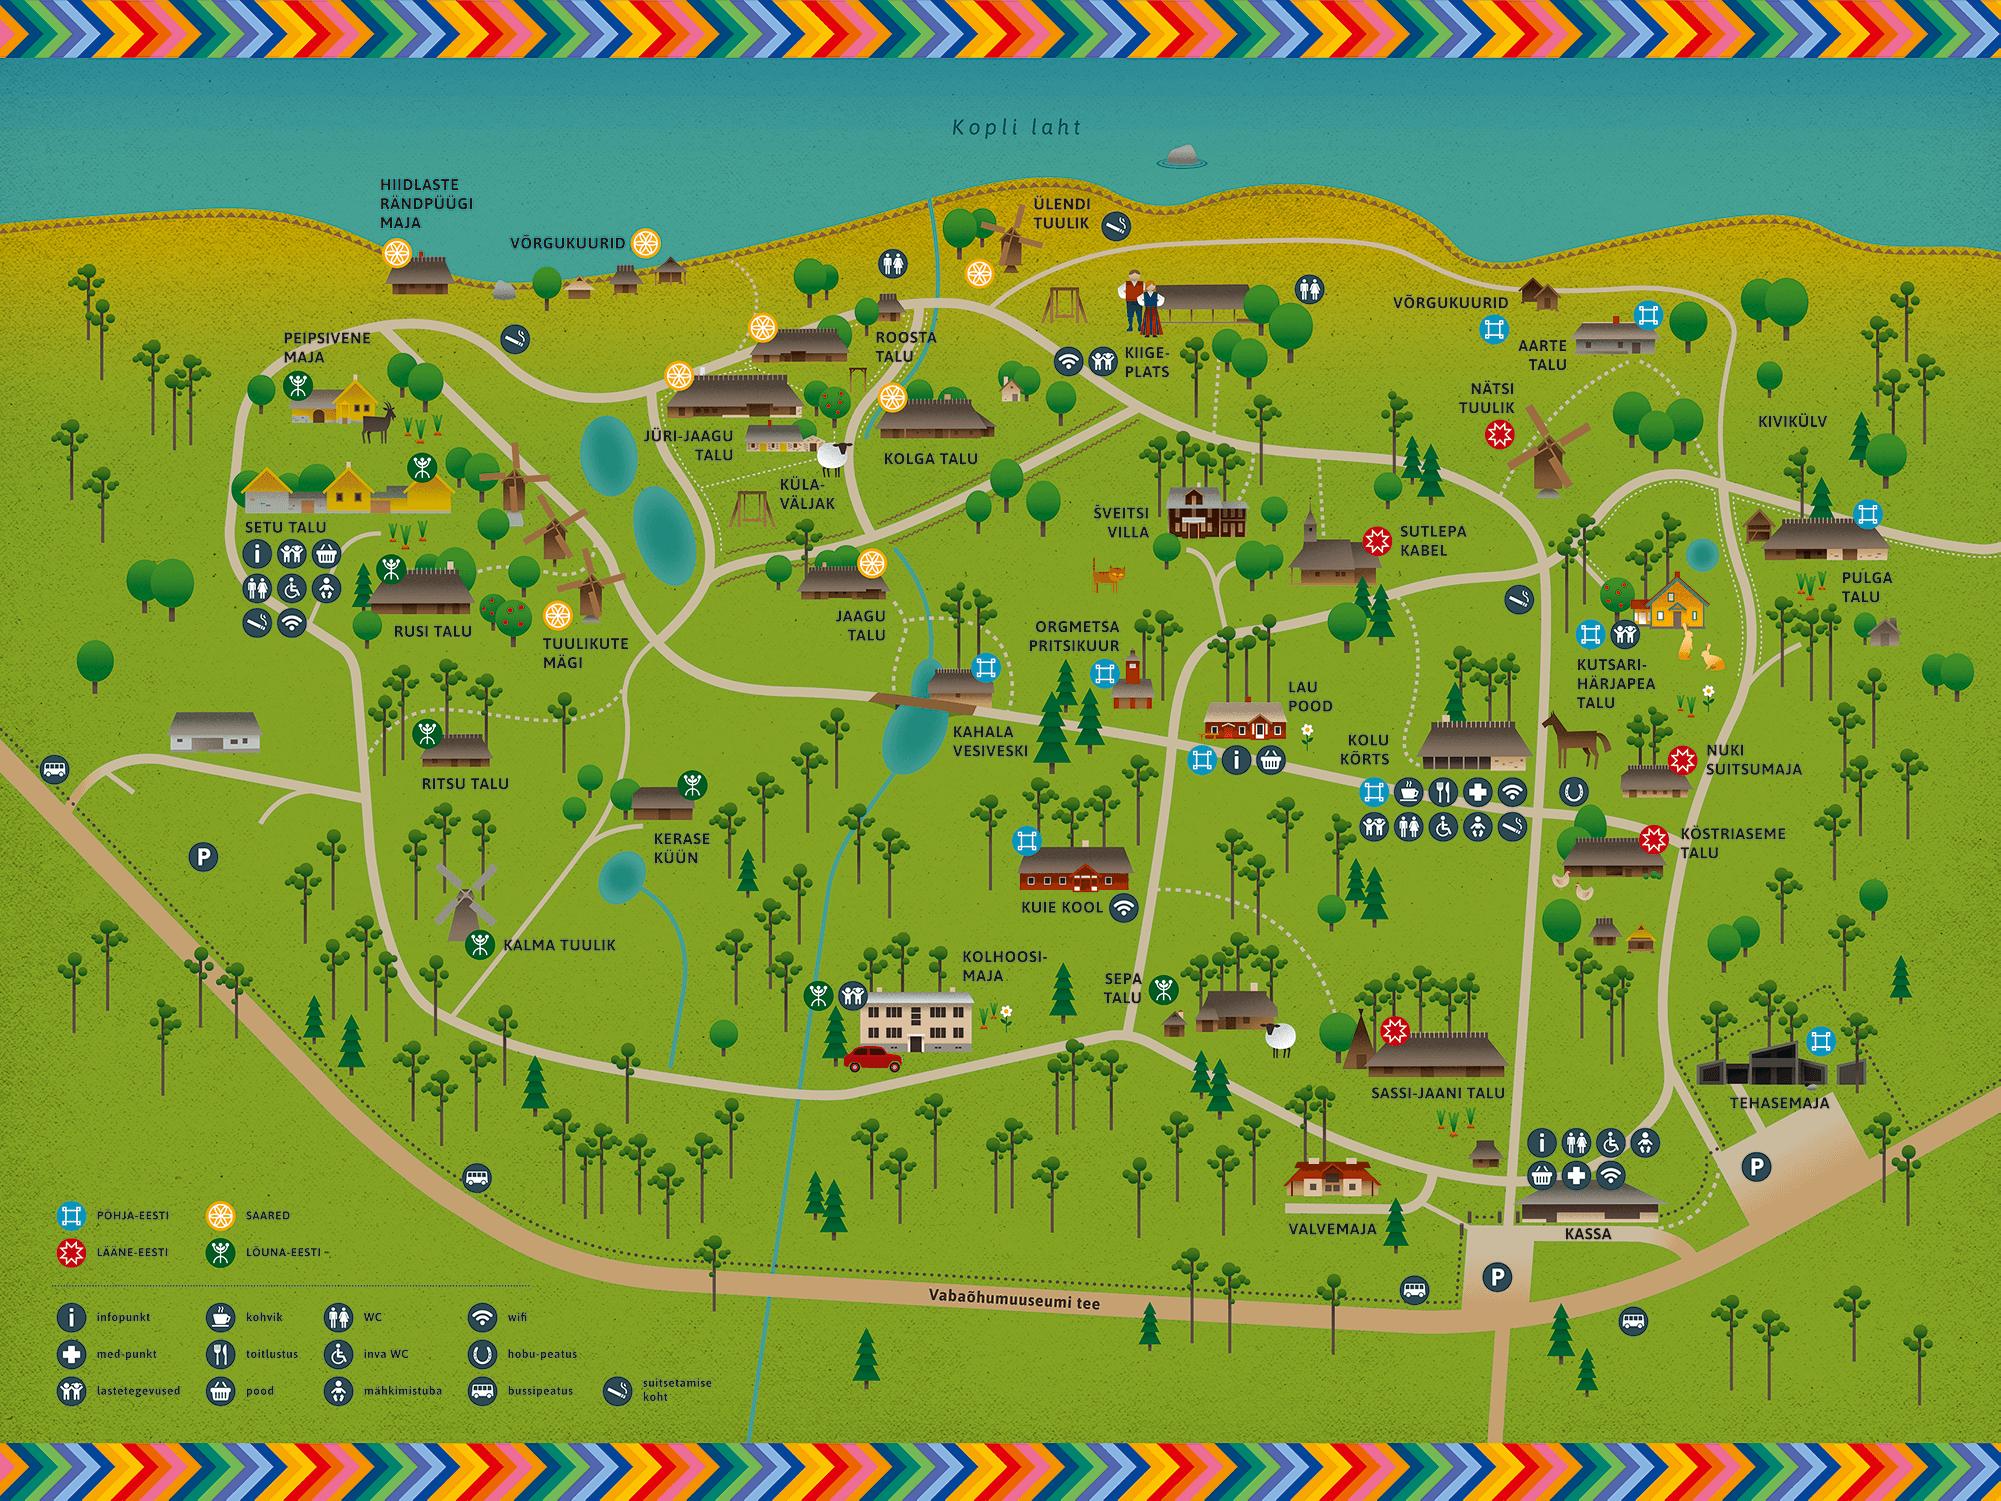 kaart_2000x1500-1